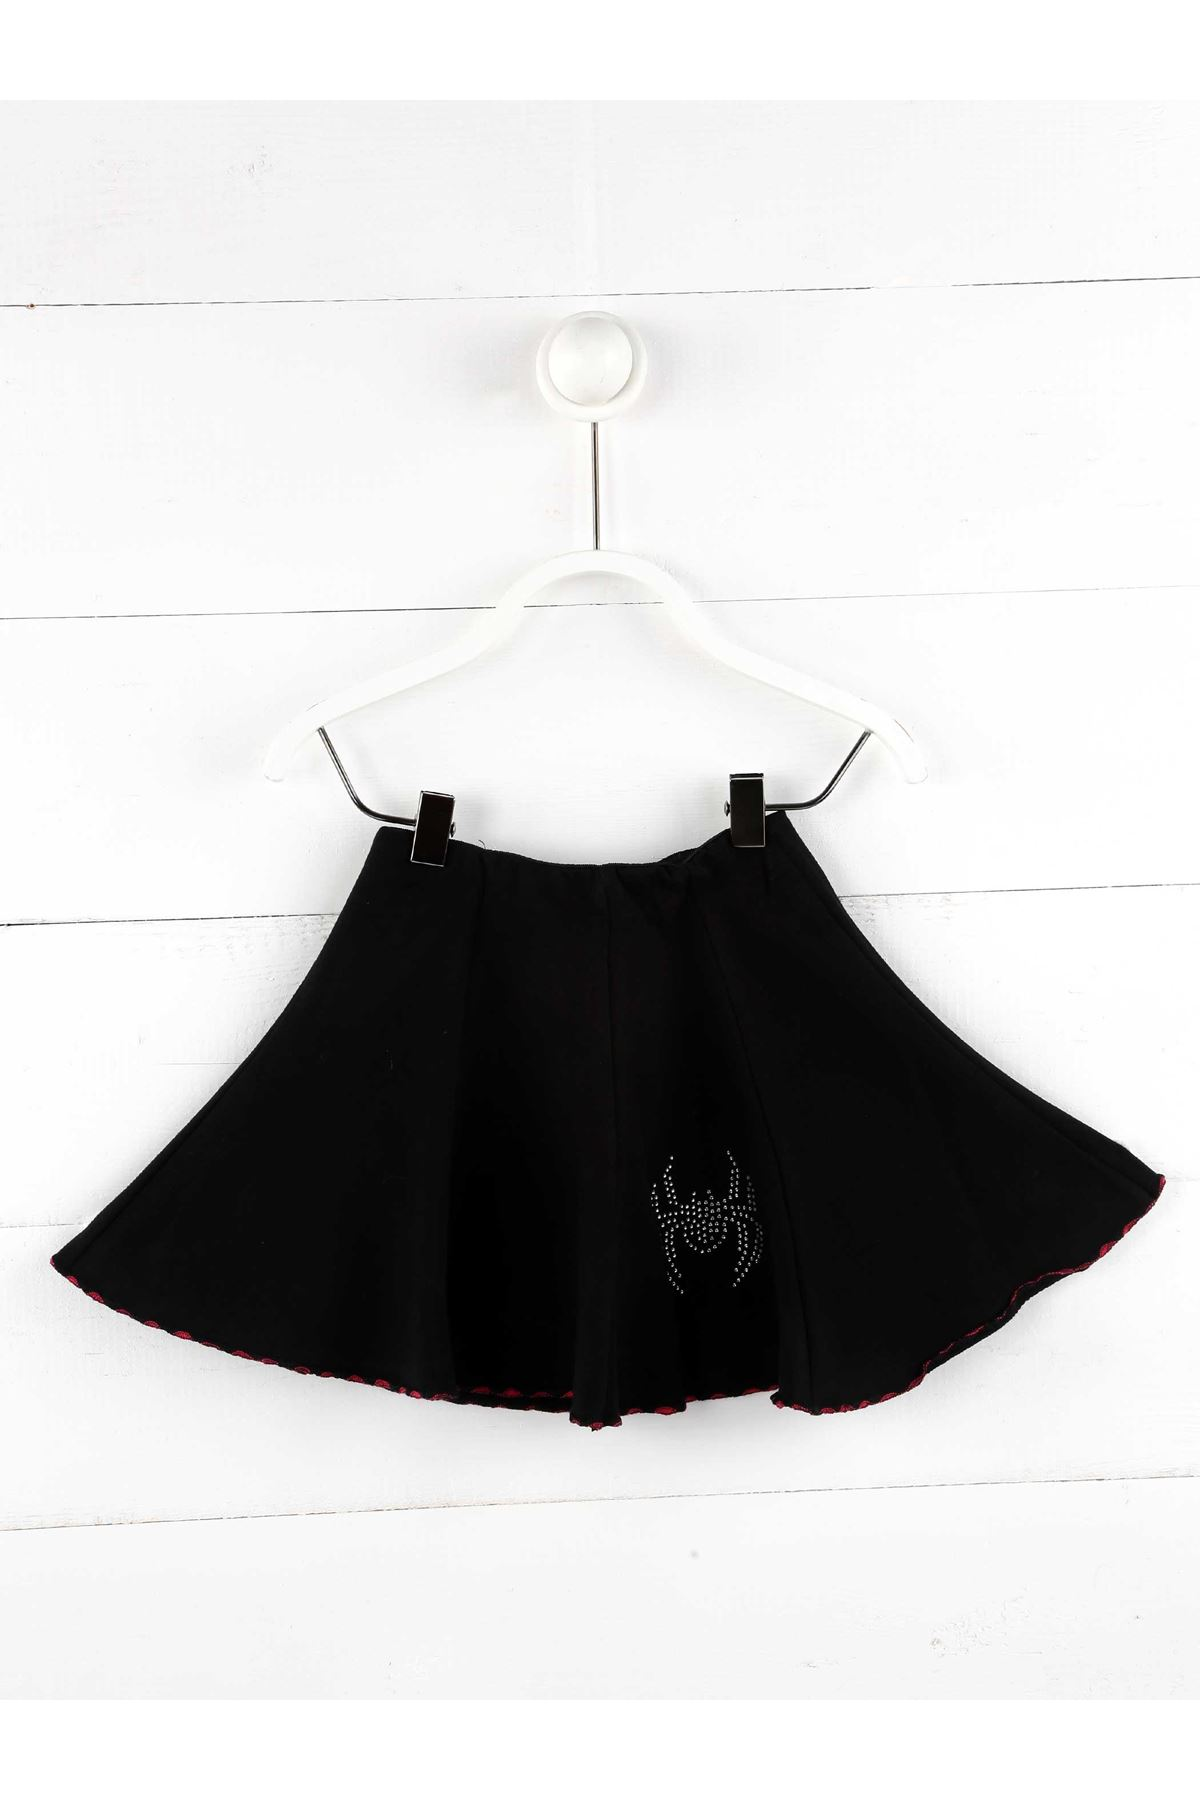 Fuchsia Summer Girl Child Skirted Suit